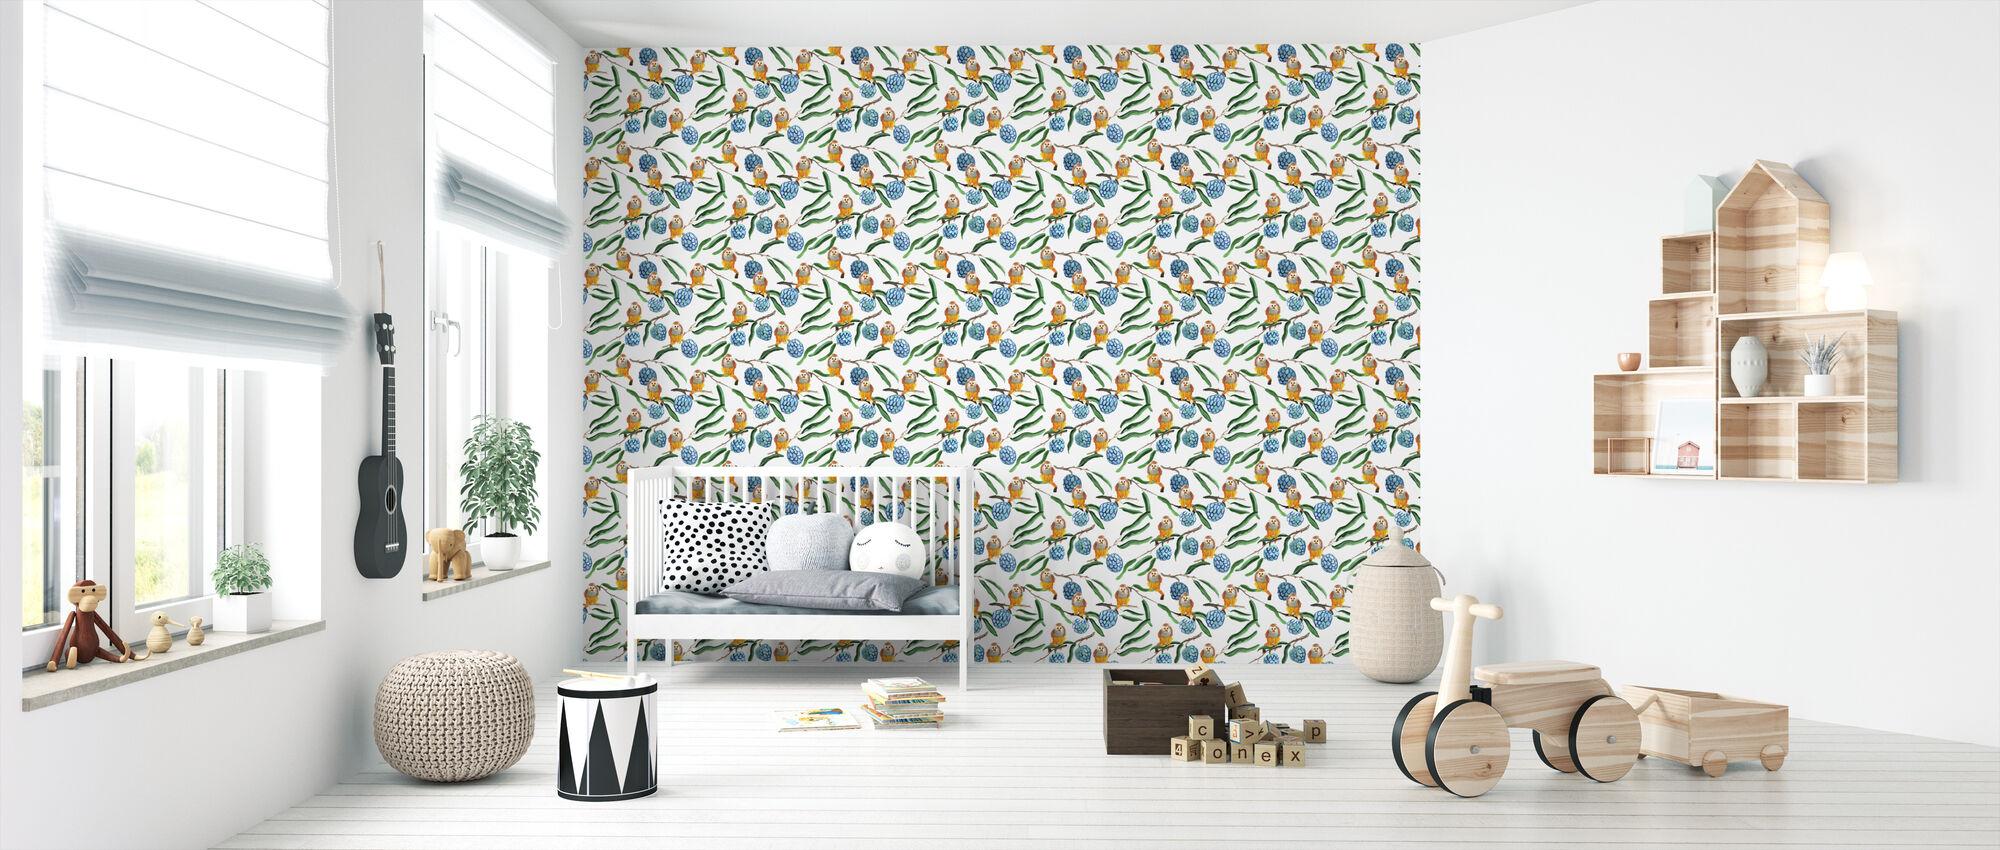 Sugar Apple - Wallpaper - Nursery